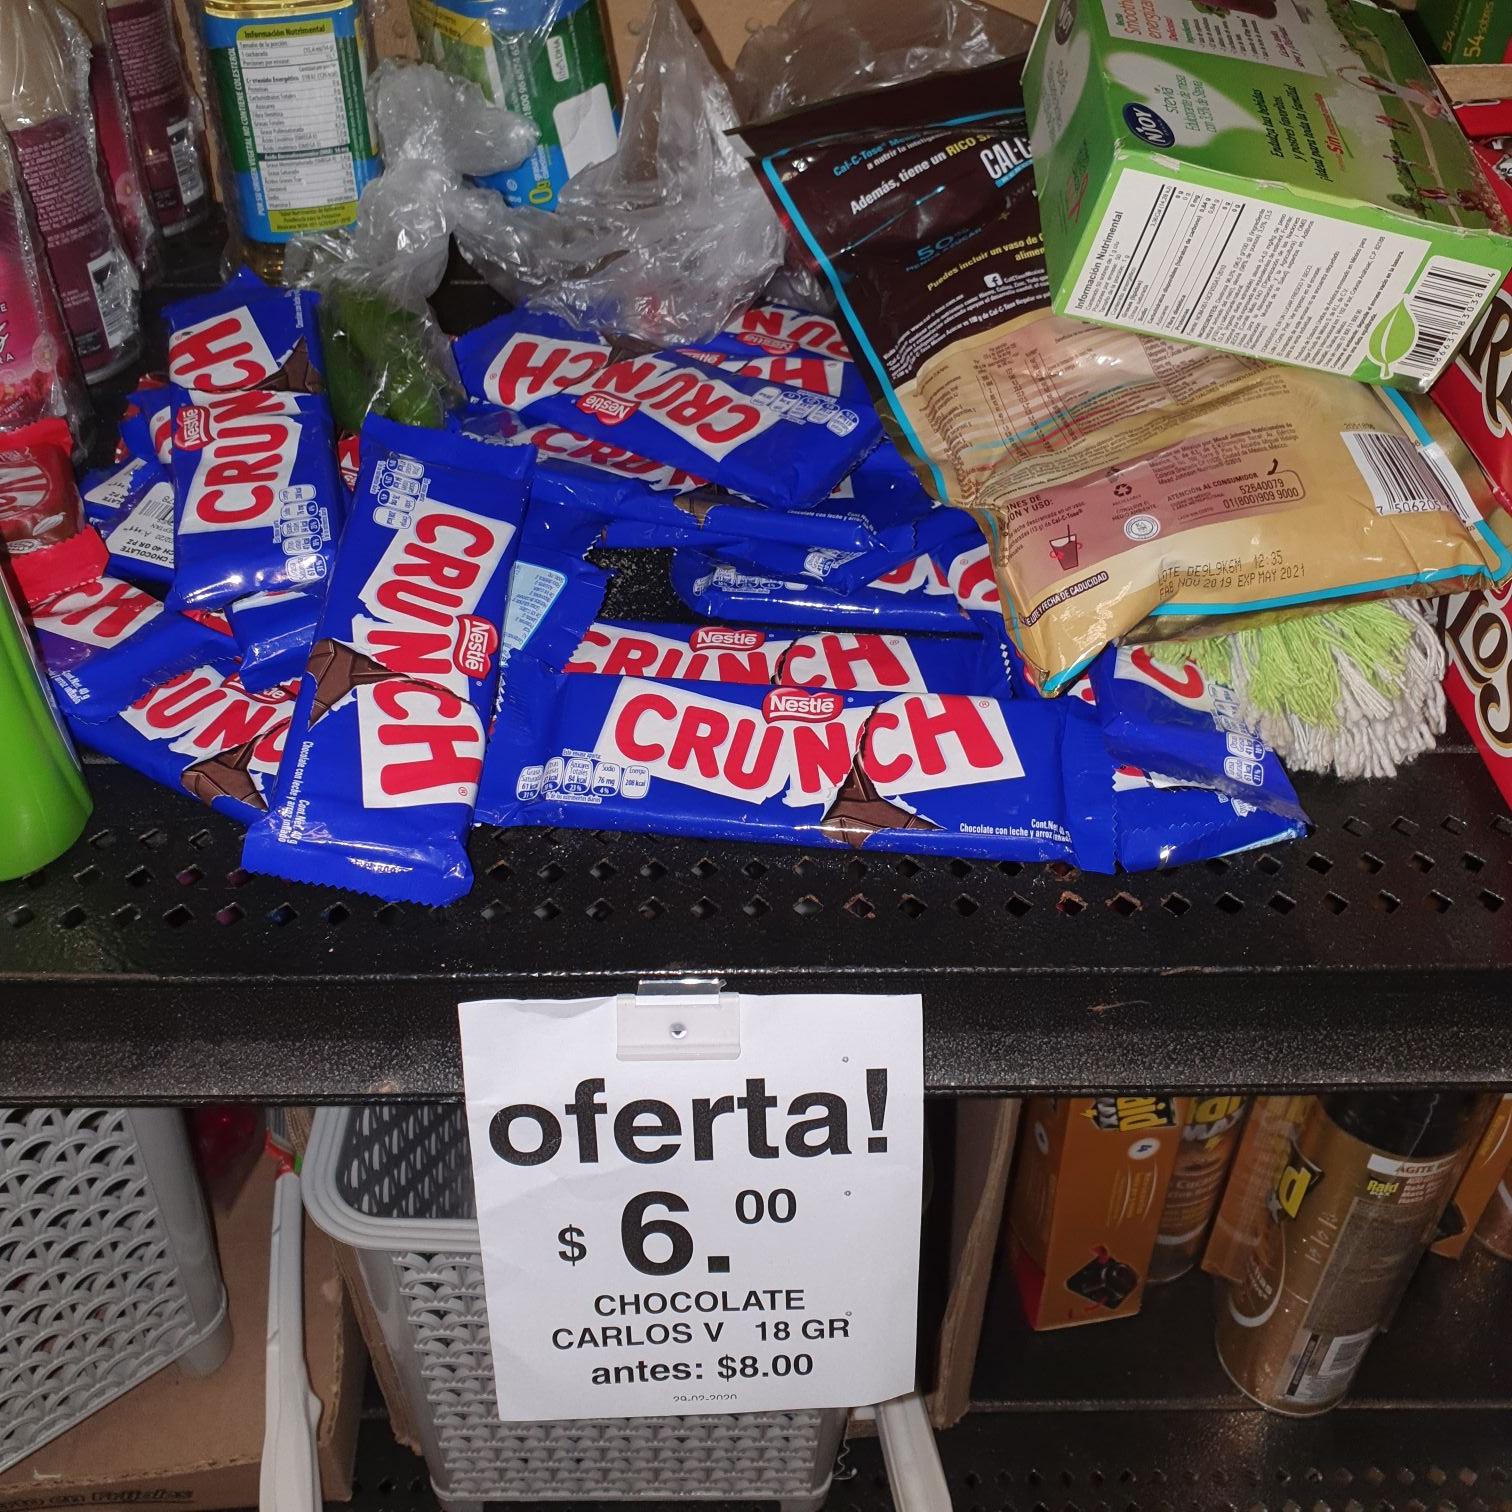 Soriana: Chocolates Crunch y Carlos V a $6